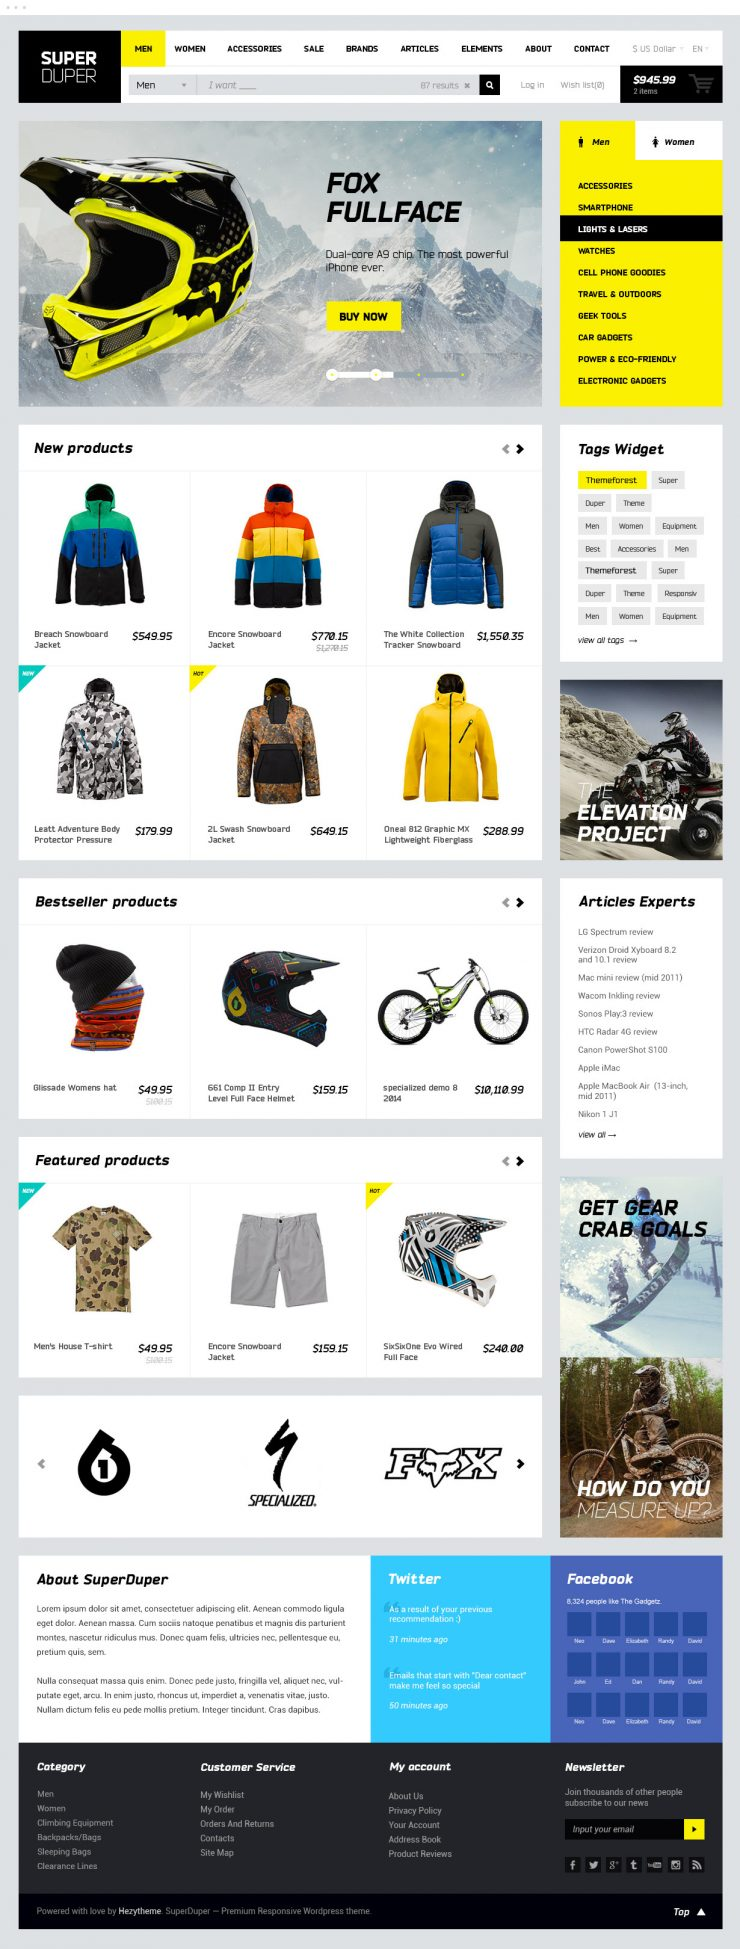 Sportswear Shopping Website PSD Template www, Website Template, Website Layout, Website, webpage, Web Template, Web Resources, web page, Web Layout, Web Interface, Web Elements, Web Design, Web, User Interface, unique, UI, Template, Stylish, Sports, Shopping, Shop, Resources, Quality, Psd Templates, pack, original, online shopping, new, Modern, Fresh, flat ui, flat template, flat style, flat psd, Flat Design, Flat, Elements, ecommerce template, ecommerce psd template, eCommerce, detailed, Design, Creative, Cloths, clothing, Clean, Business,